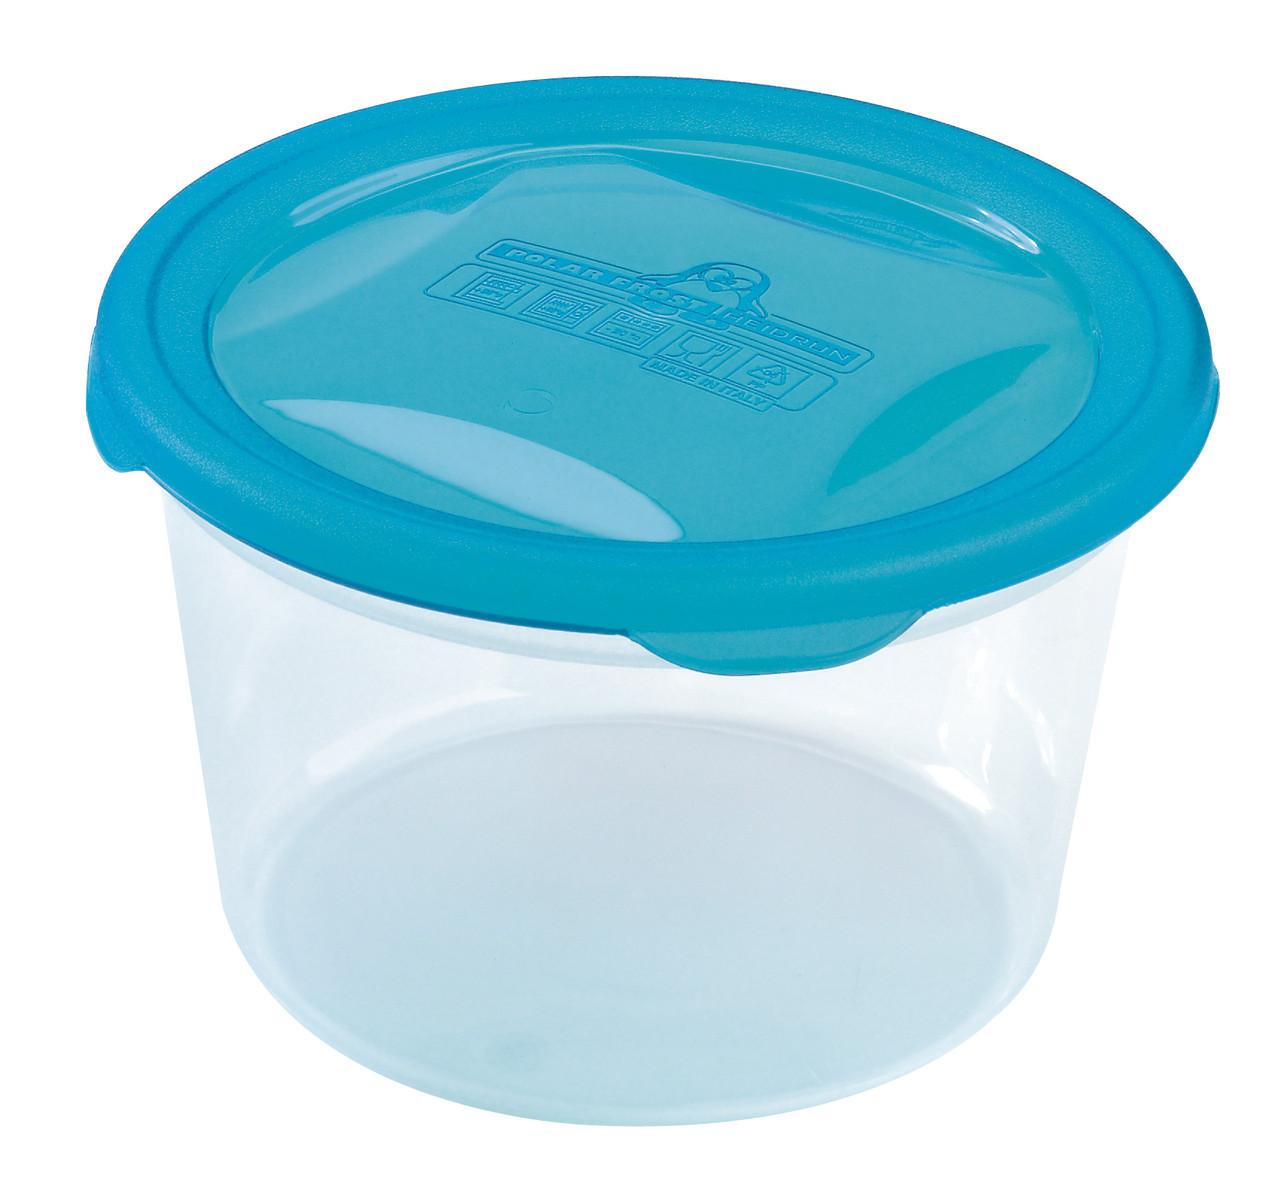 Контейнер для хранения в морозилке 1л Heidrun PolarFrost 14,5*9,1см (HDR-1771)